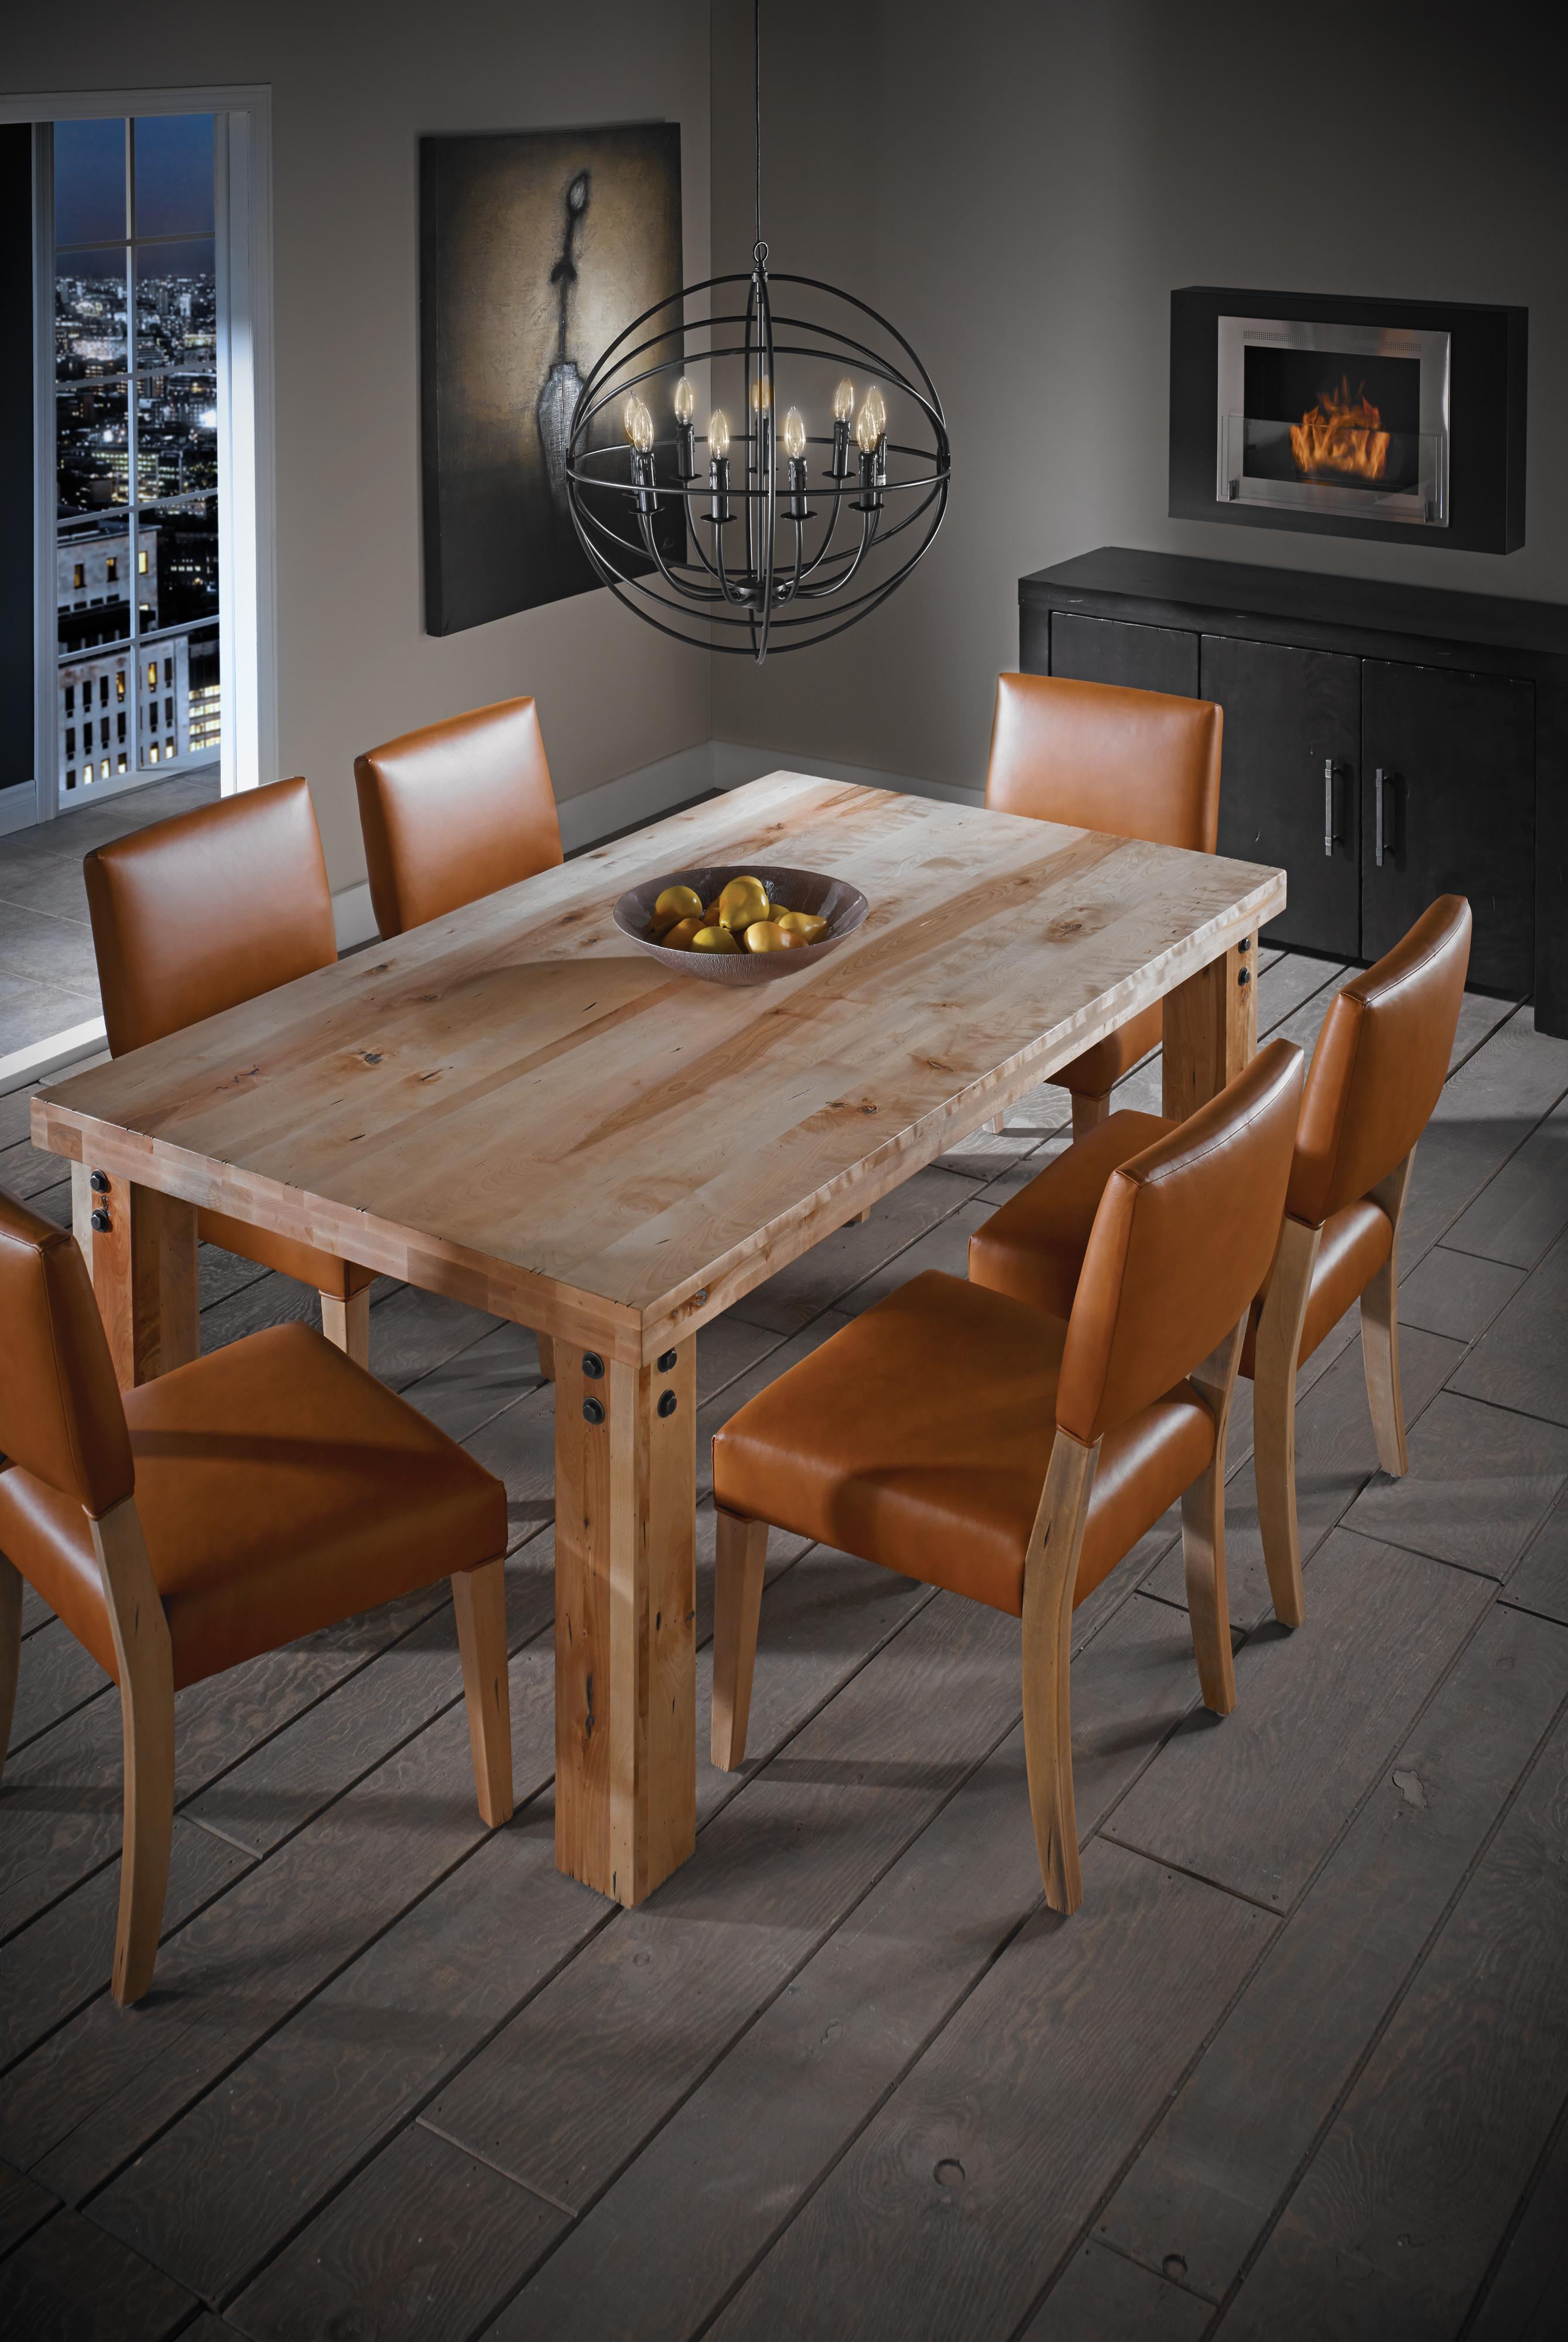 Loft - Custom Dining Formal Dining Room Group by Canadel at Dinette Depot